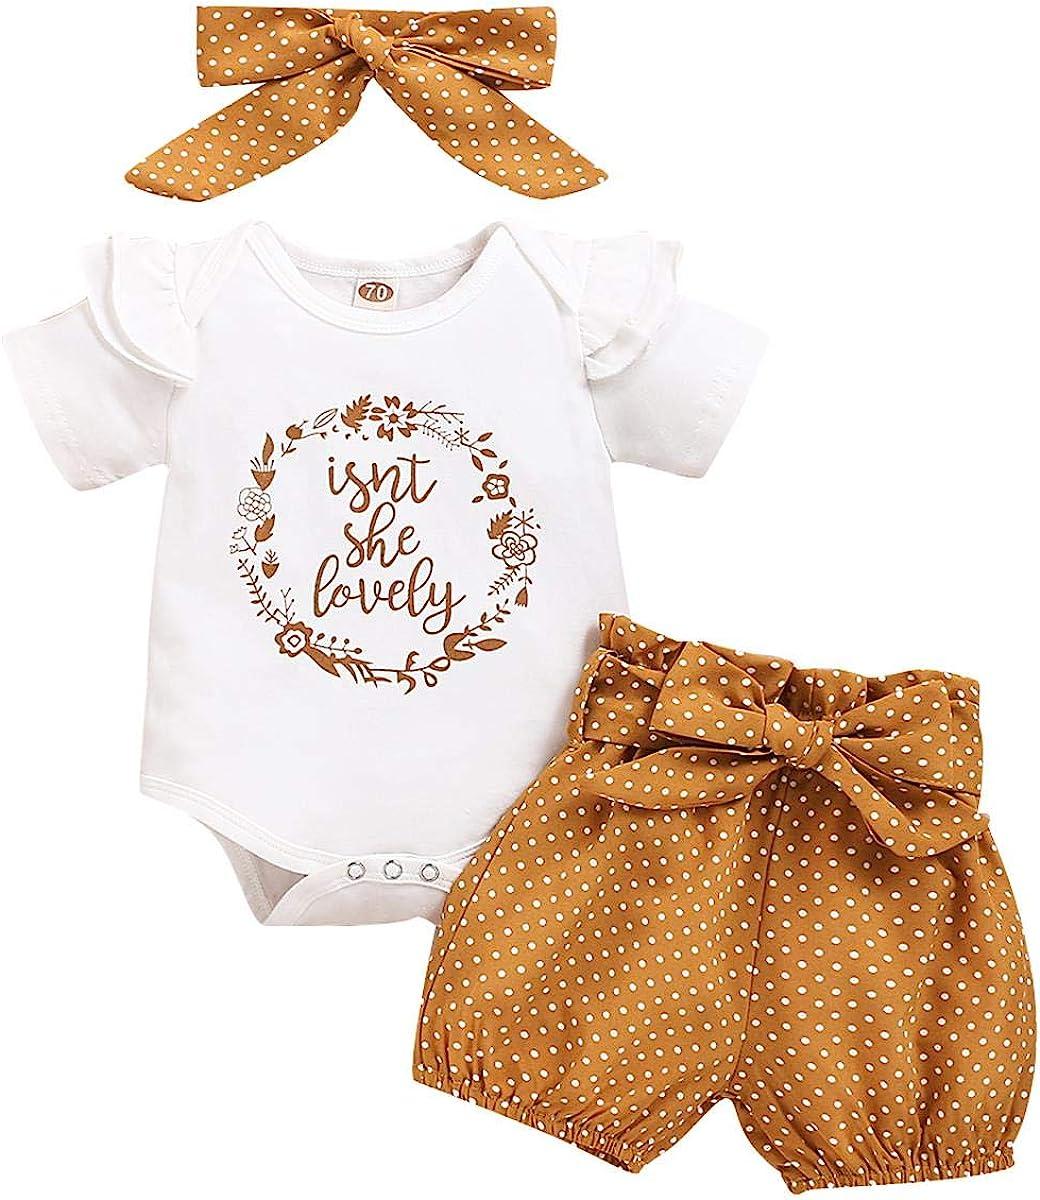 ODASDO Newborn Baby Girl Coming Home Outfit Ruffle Romper Shorts Bowknot Headband 3pcs Summer Casual Clothes Set 0-18M